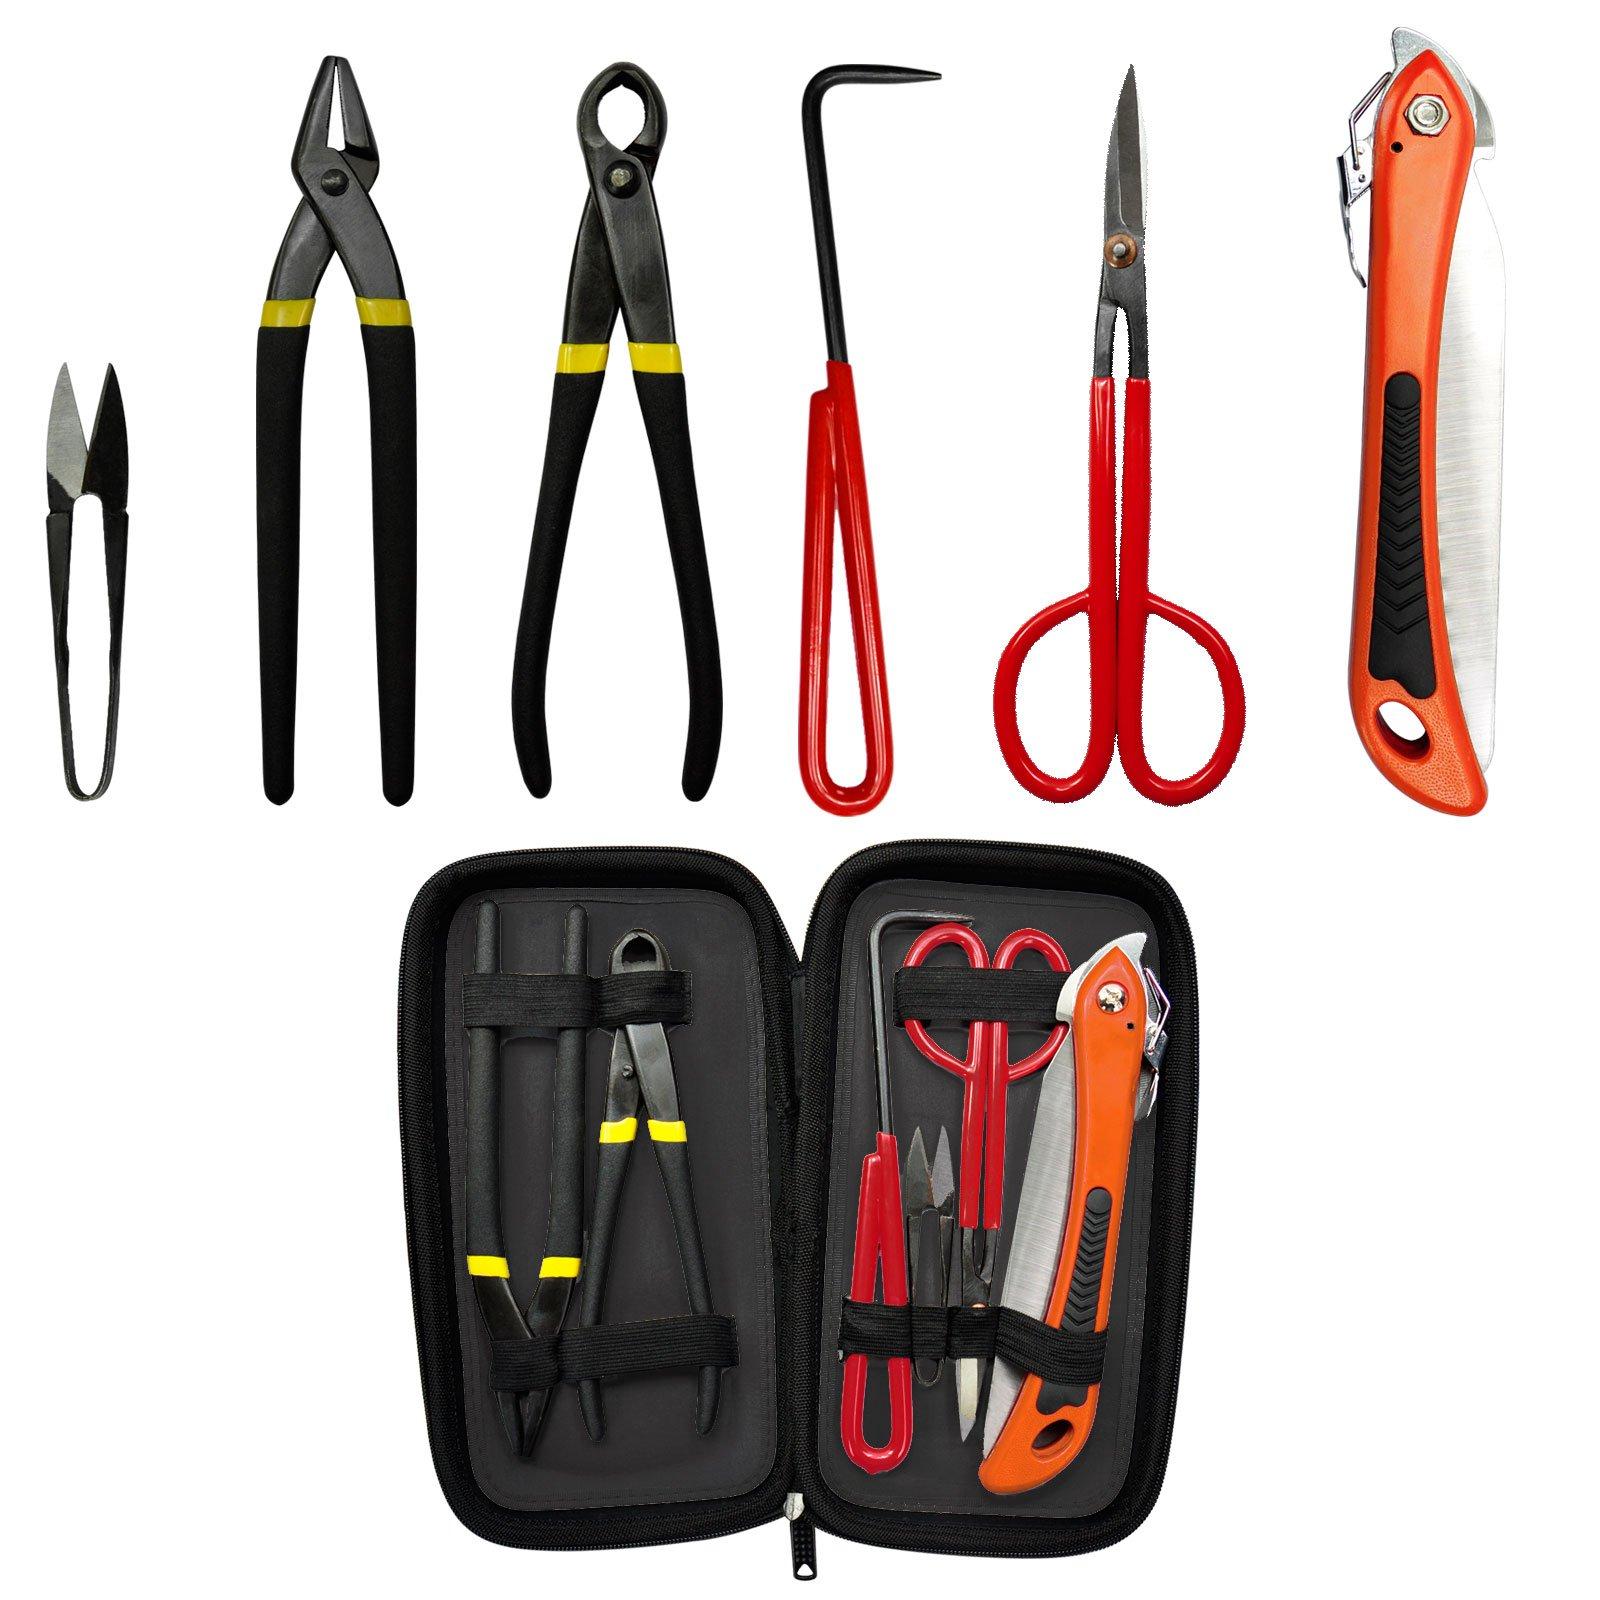 Voilamart 6 Piece Bonsai Tool Kit with Case, Carbon Steel Scissor Cutter Shear Set Garden Plant Tools